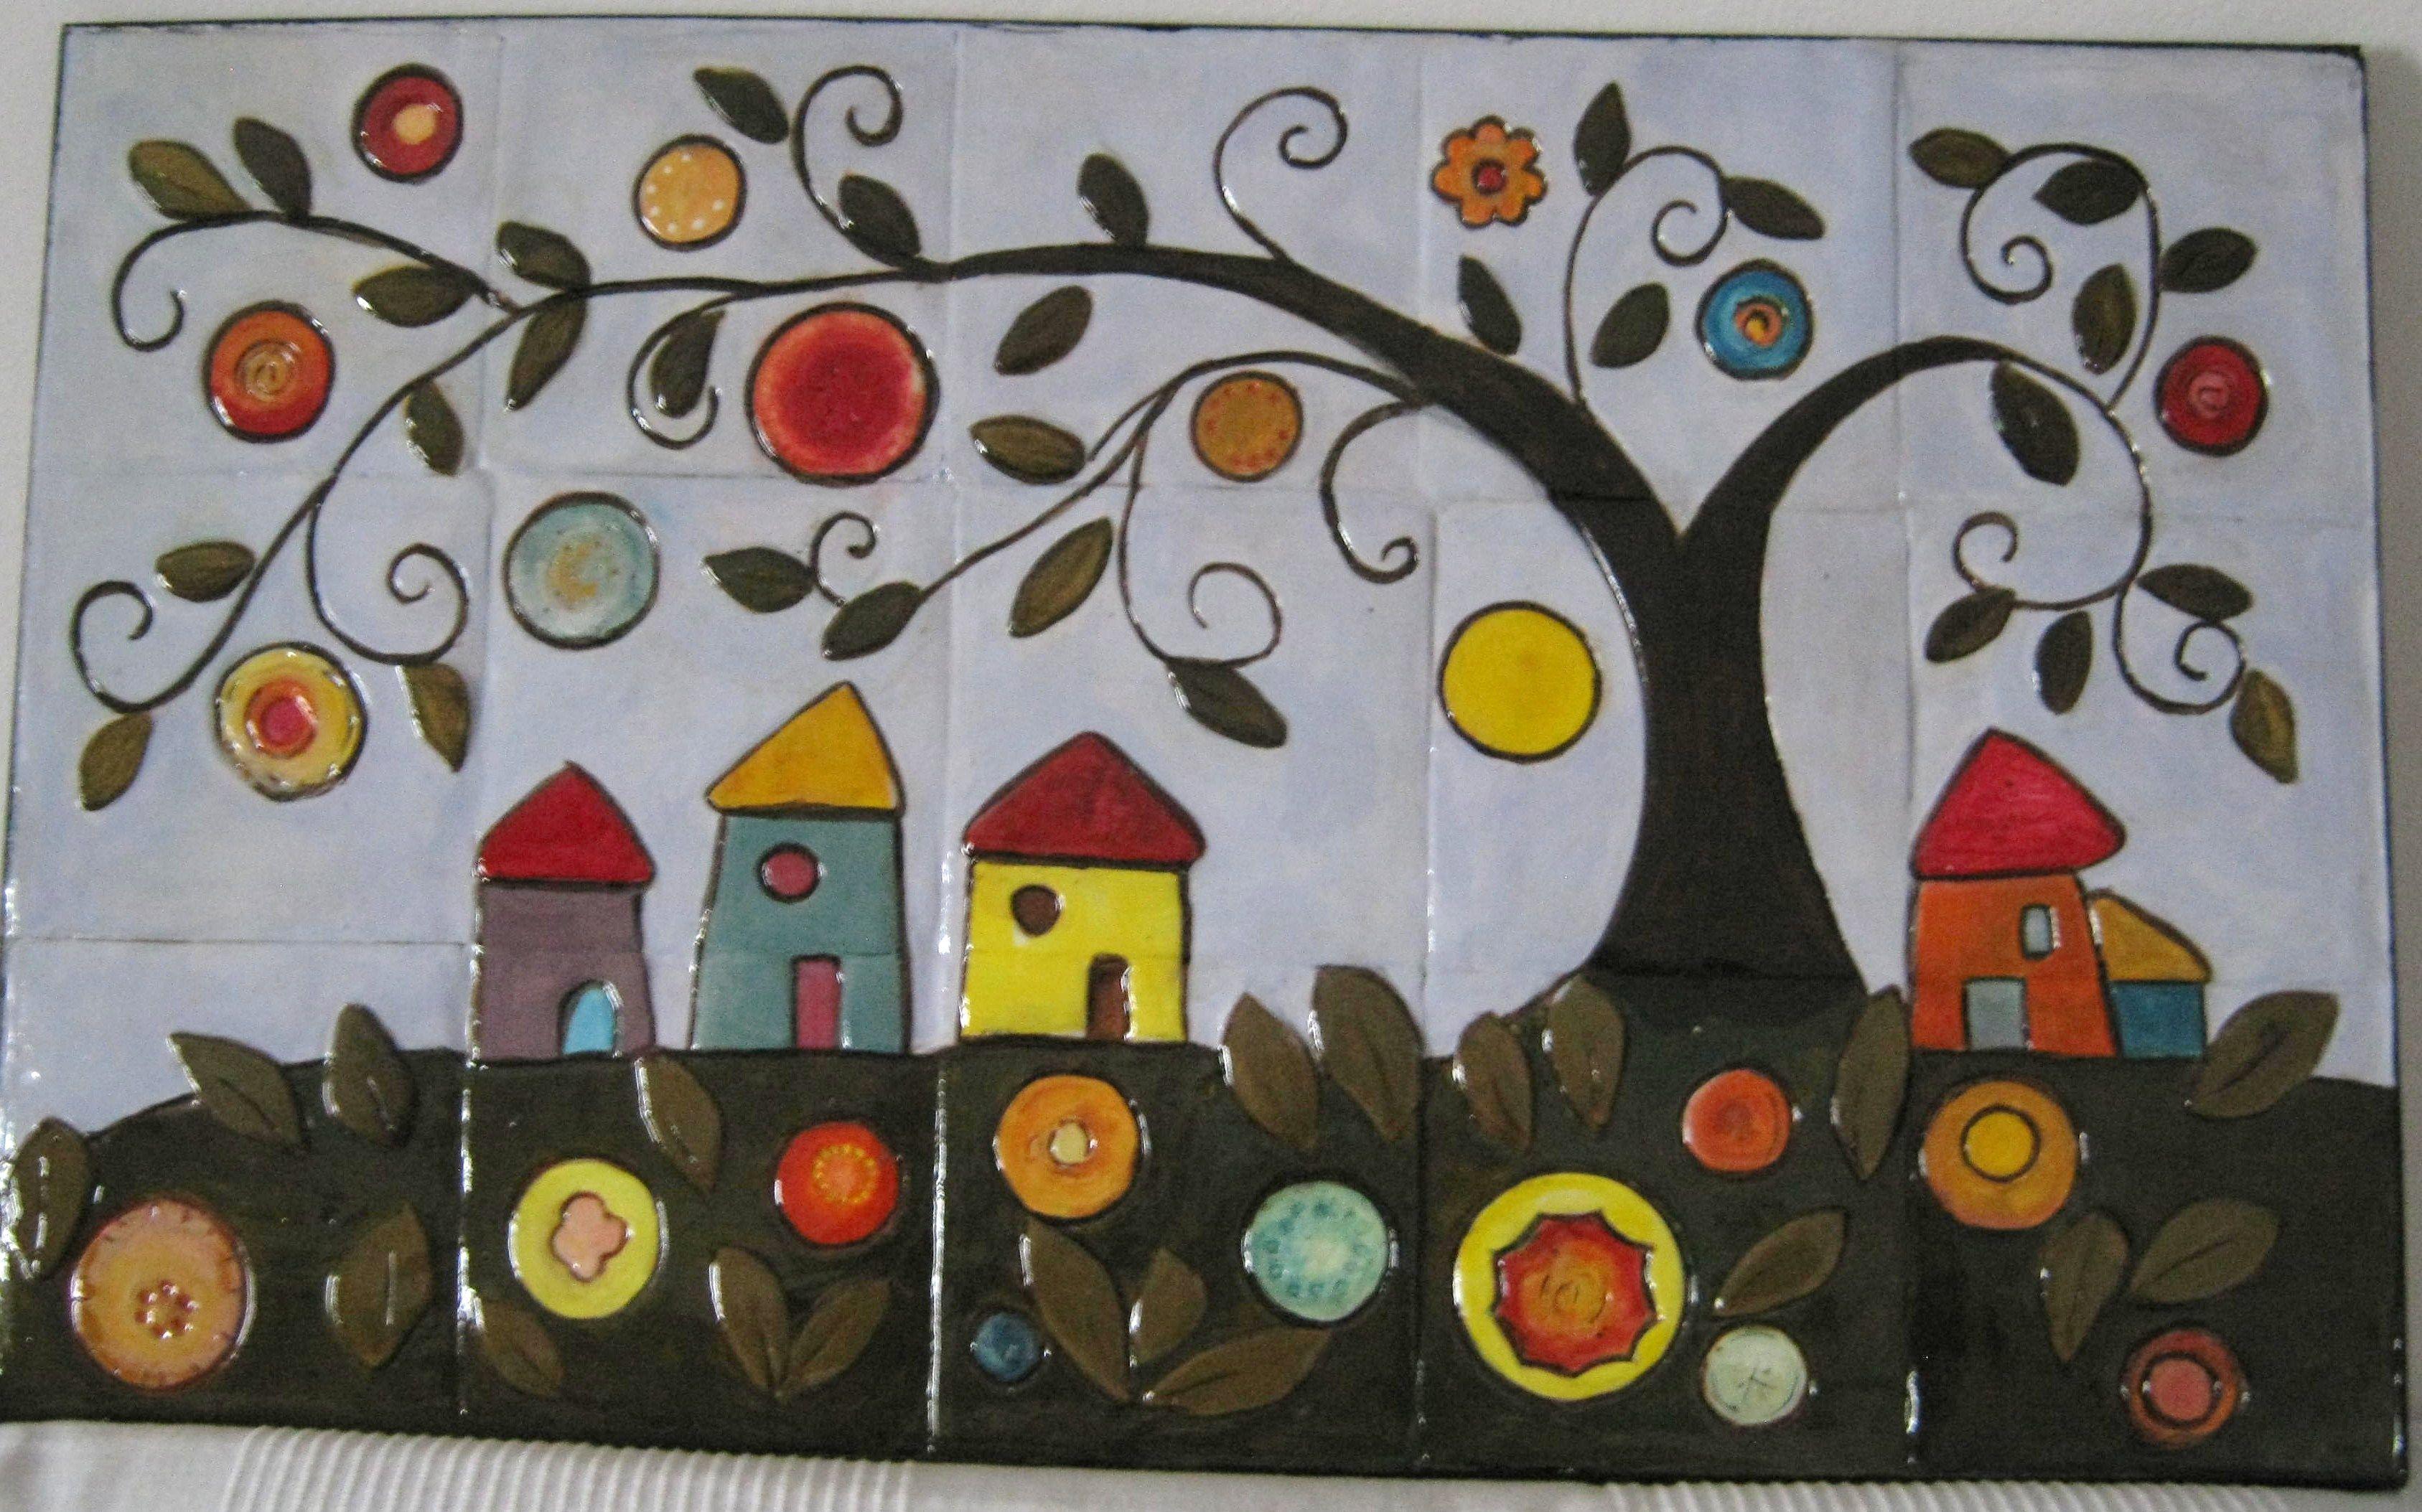 Piastrelle Di Ceramica Decorate.Paraspruzzi Per Cucina In Mattonelle Di Ceramica Decorate